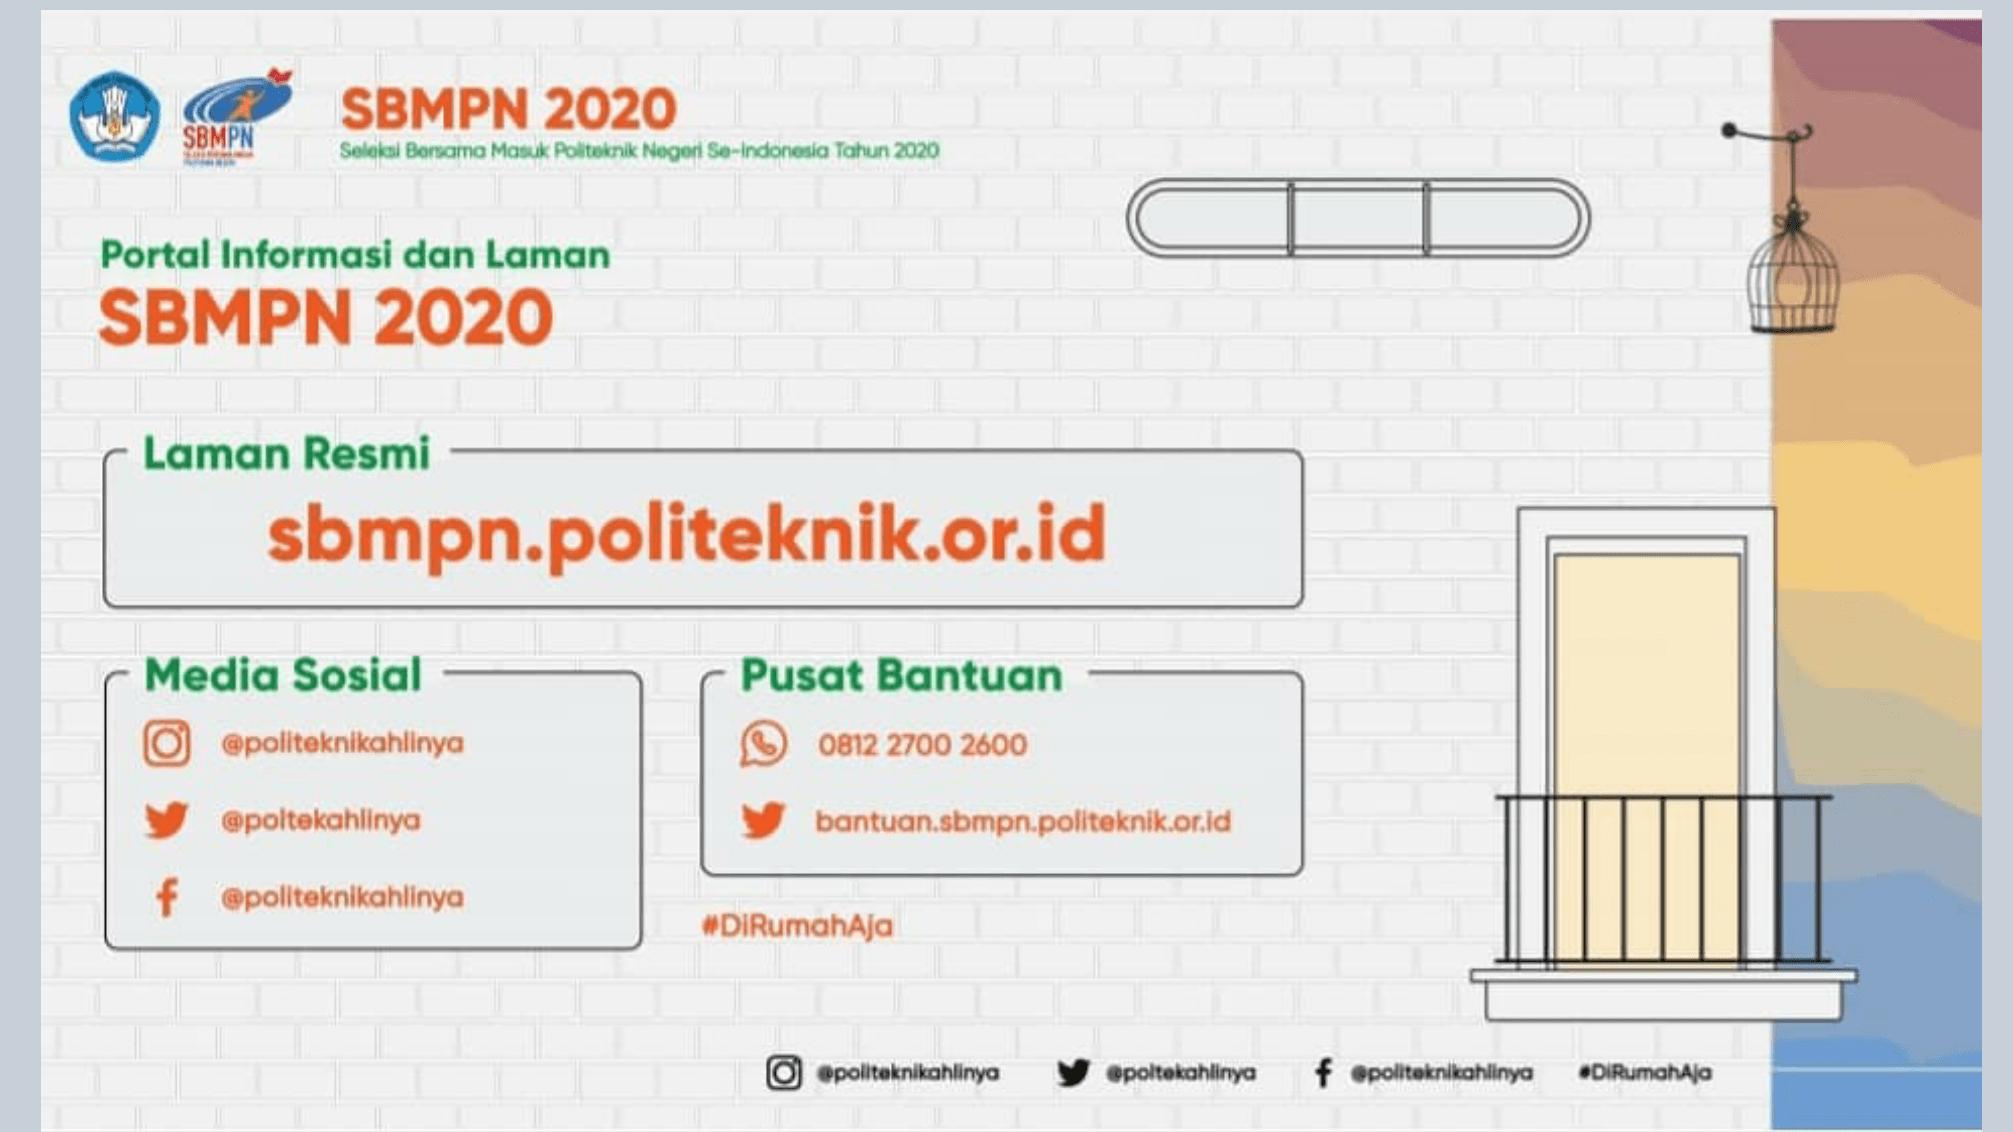 SBMPN 2020